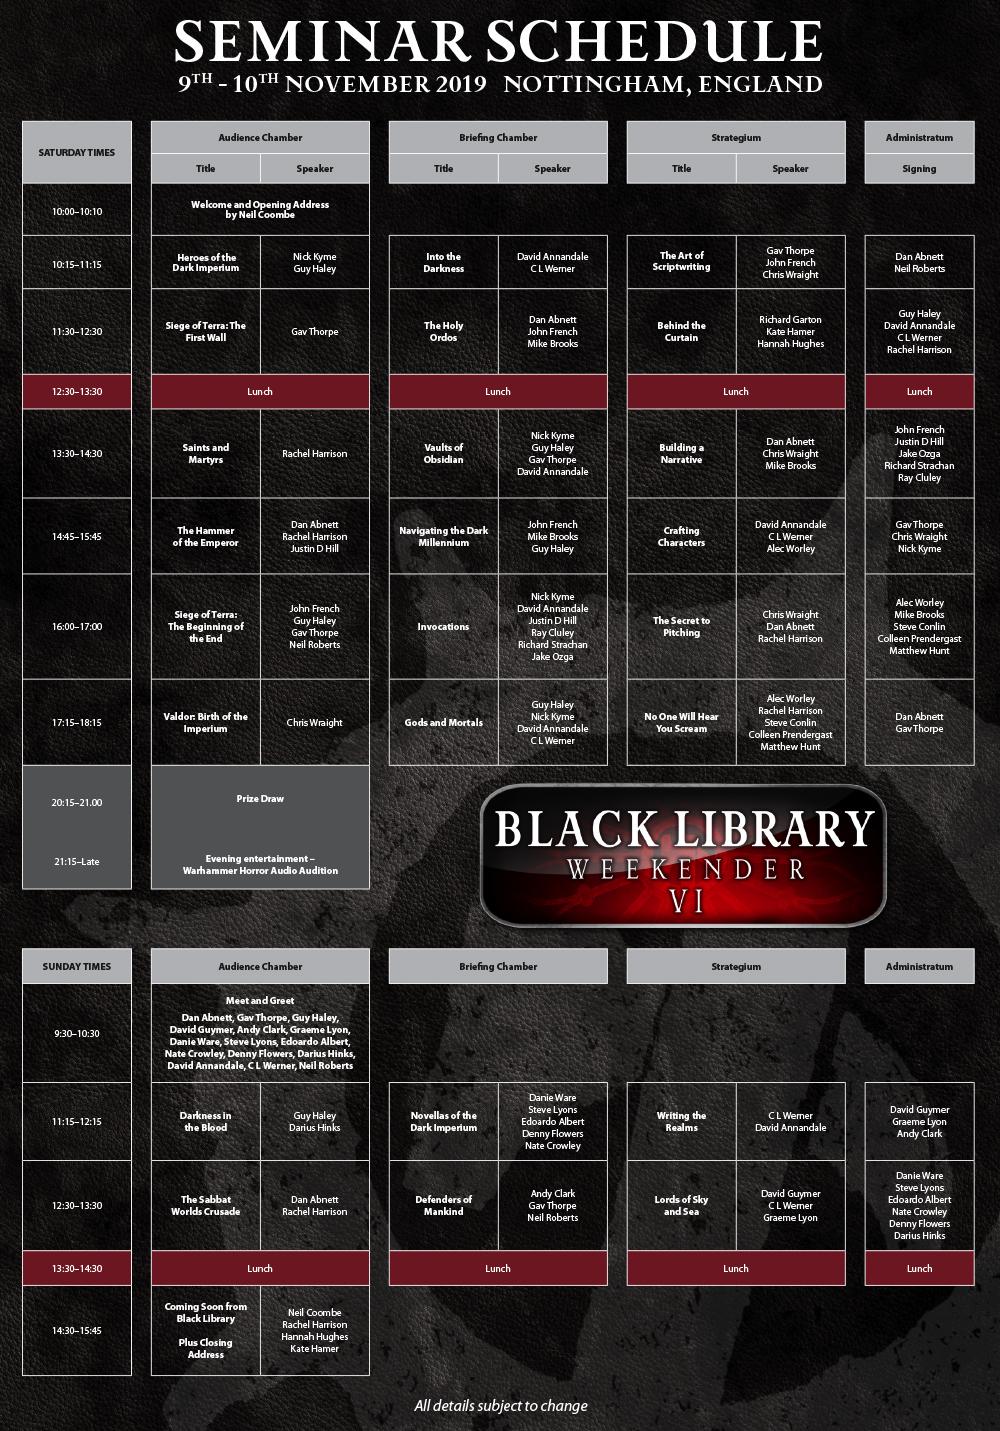 BL-Library-Timetable-1.jpg